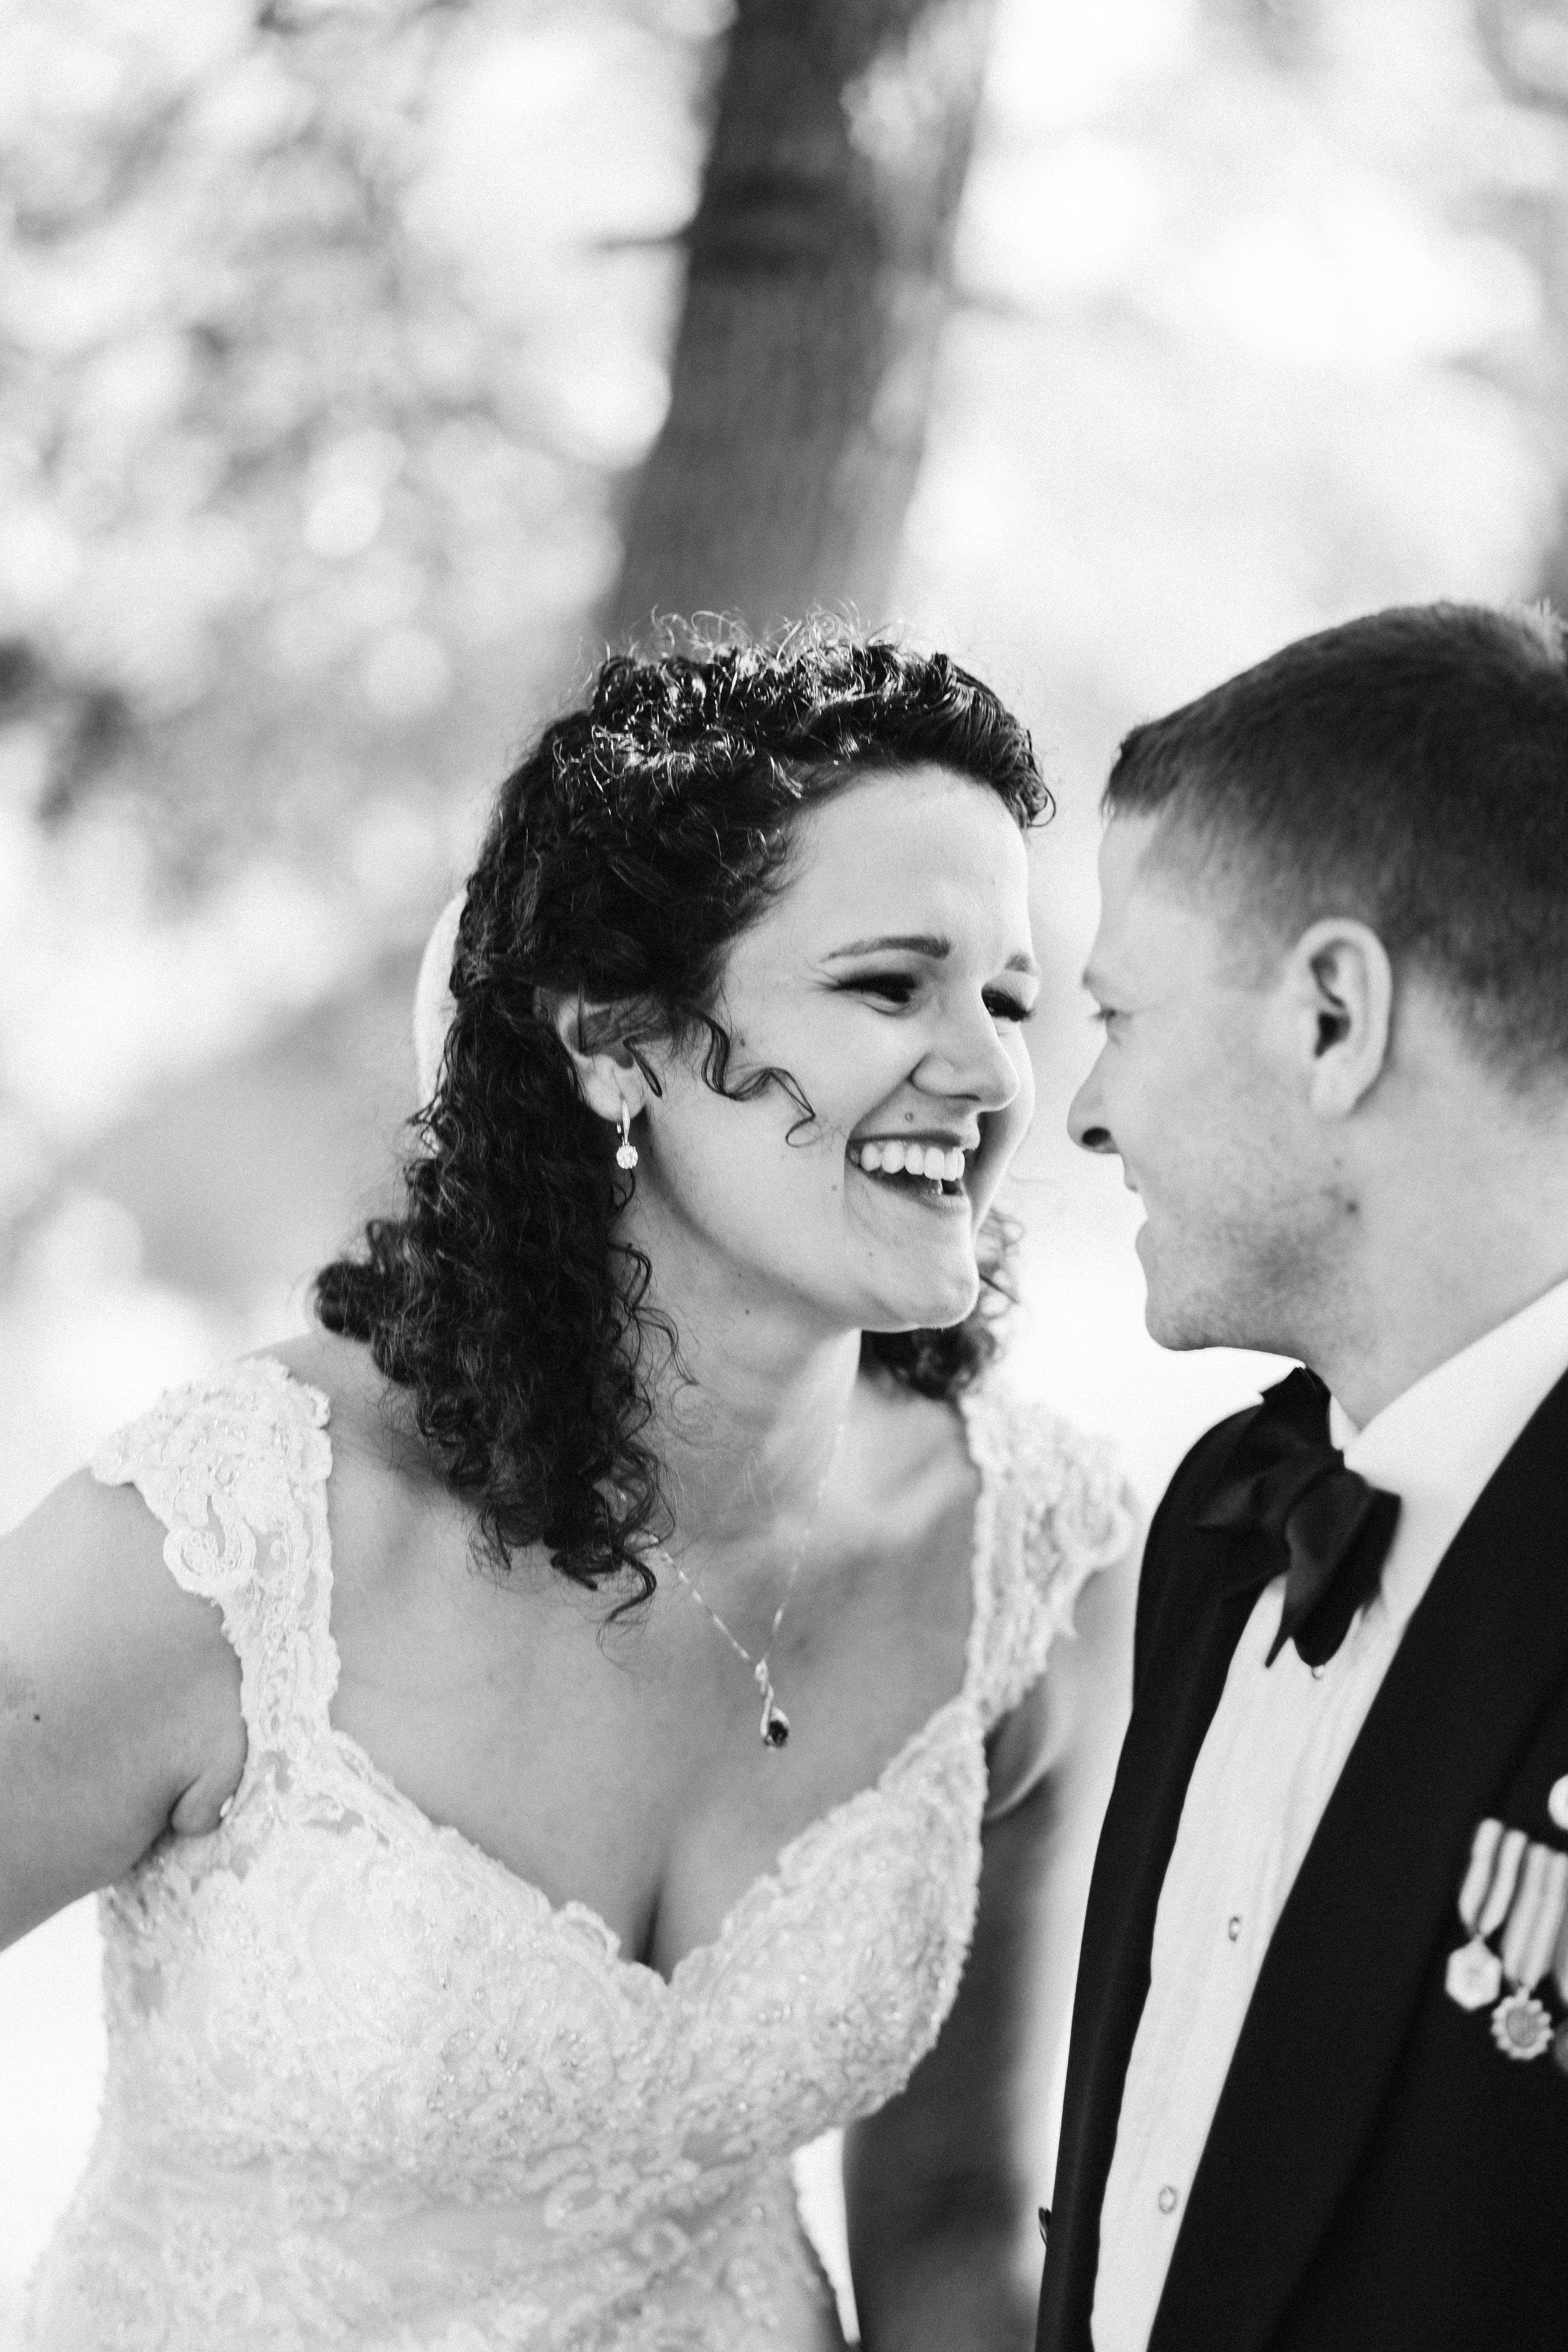 2018.03.17 Allison and Chuck Wedding Waelti Melbourne (523 of 569).jpg